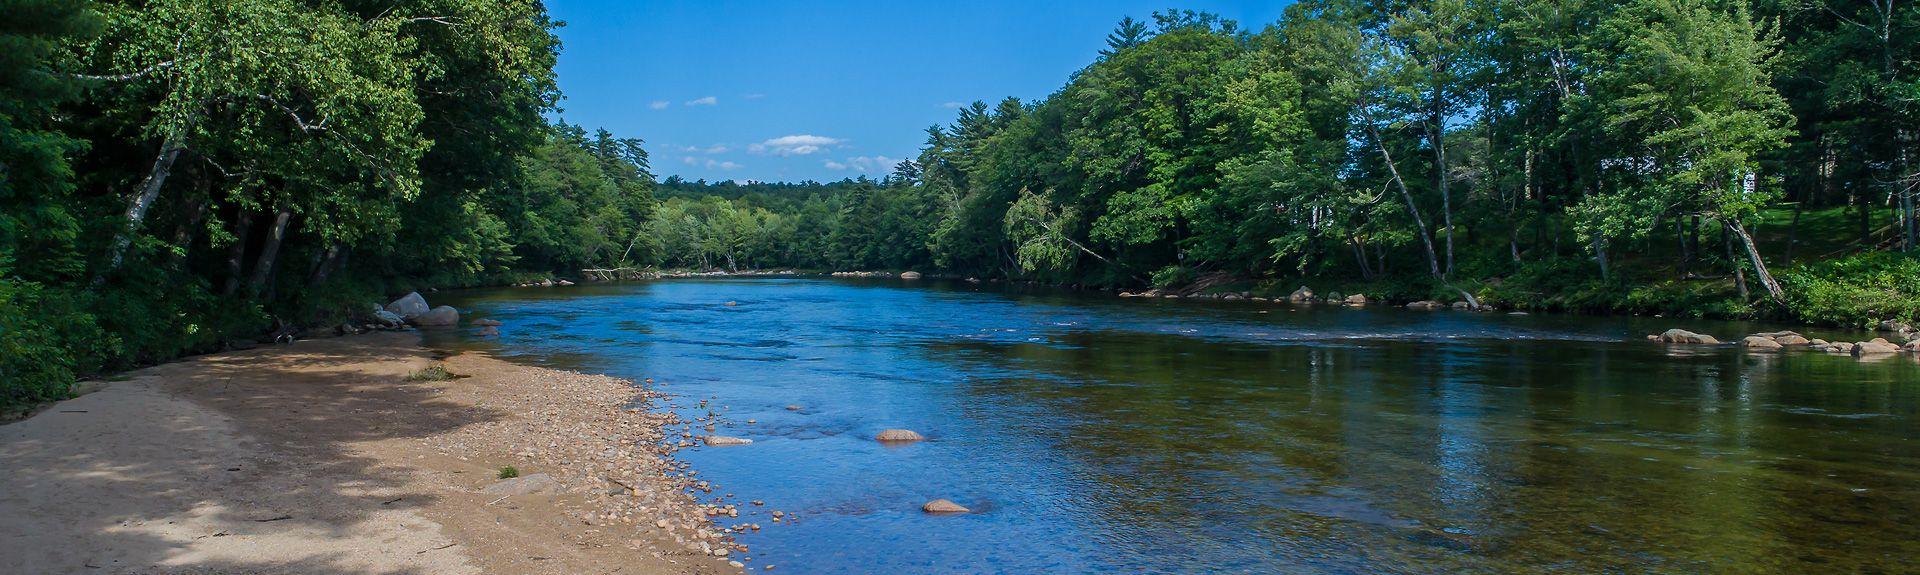 Kezar Lake, Center Lovell, Maine, United States of America